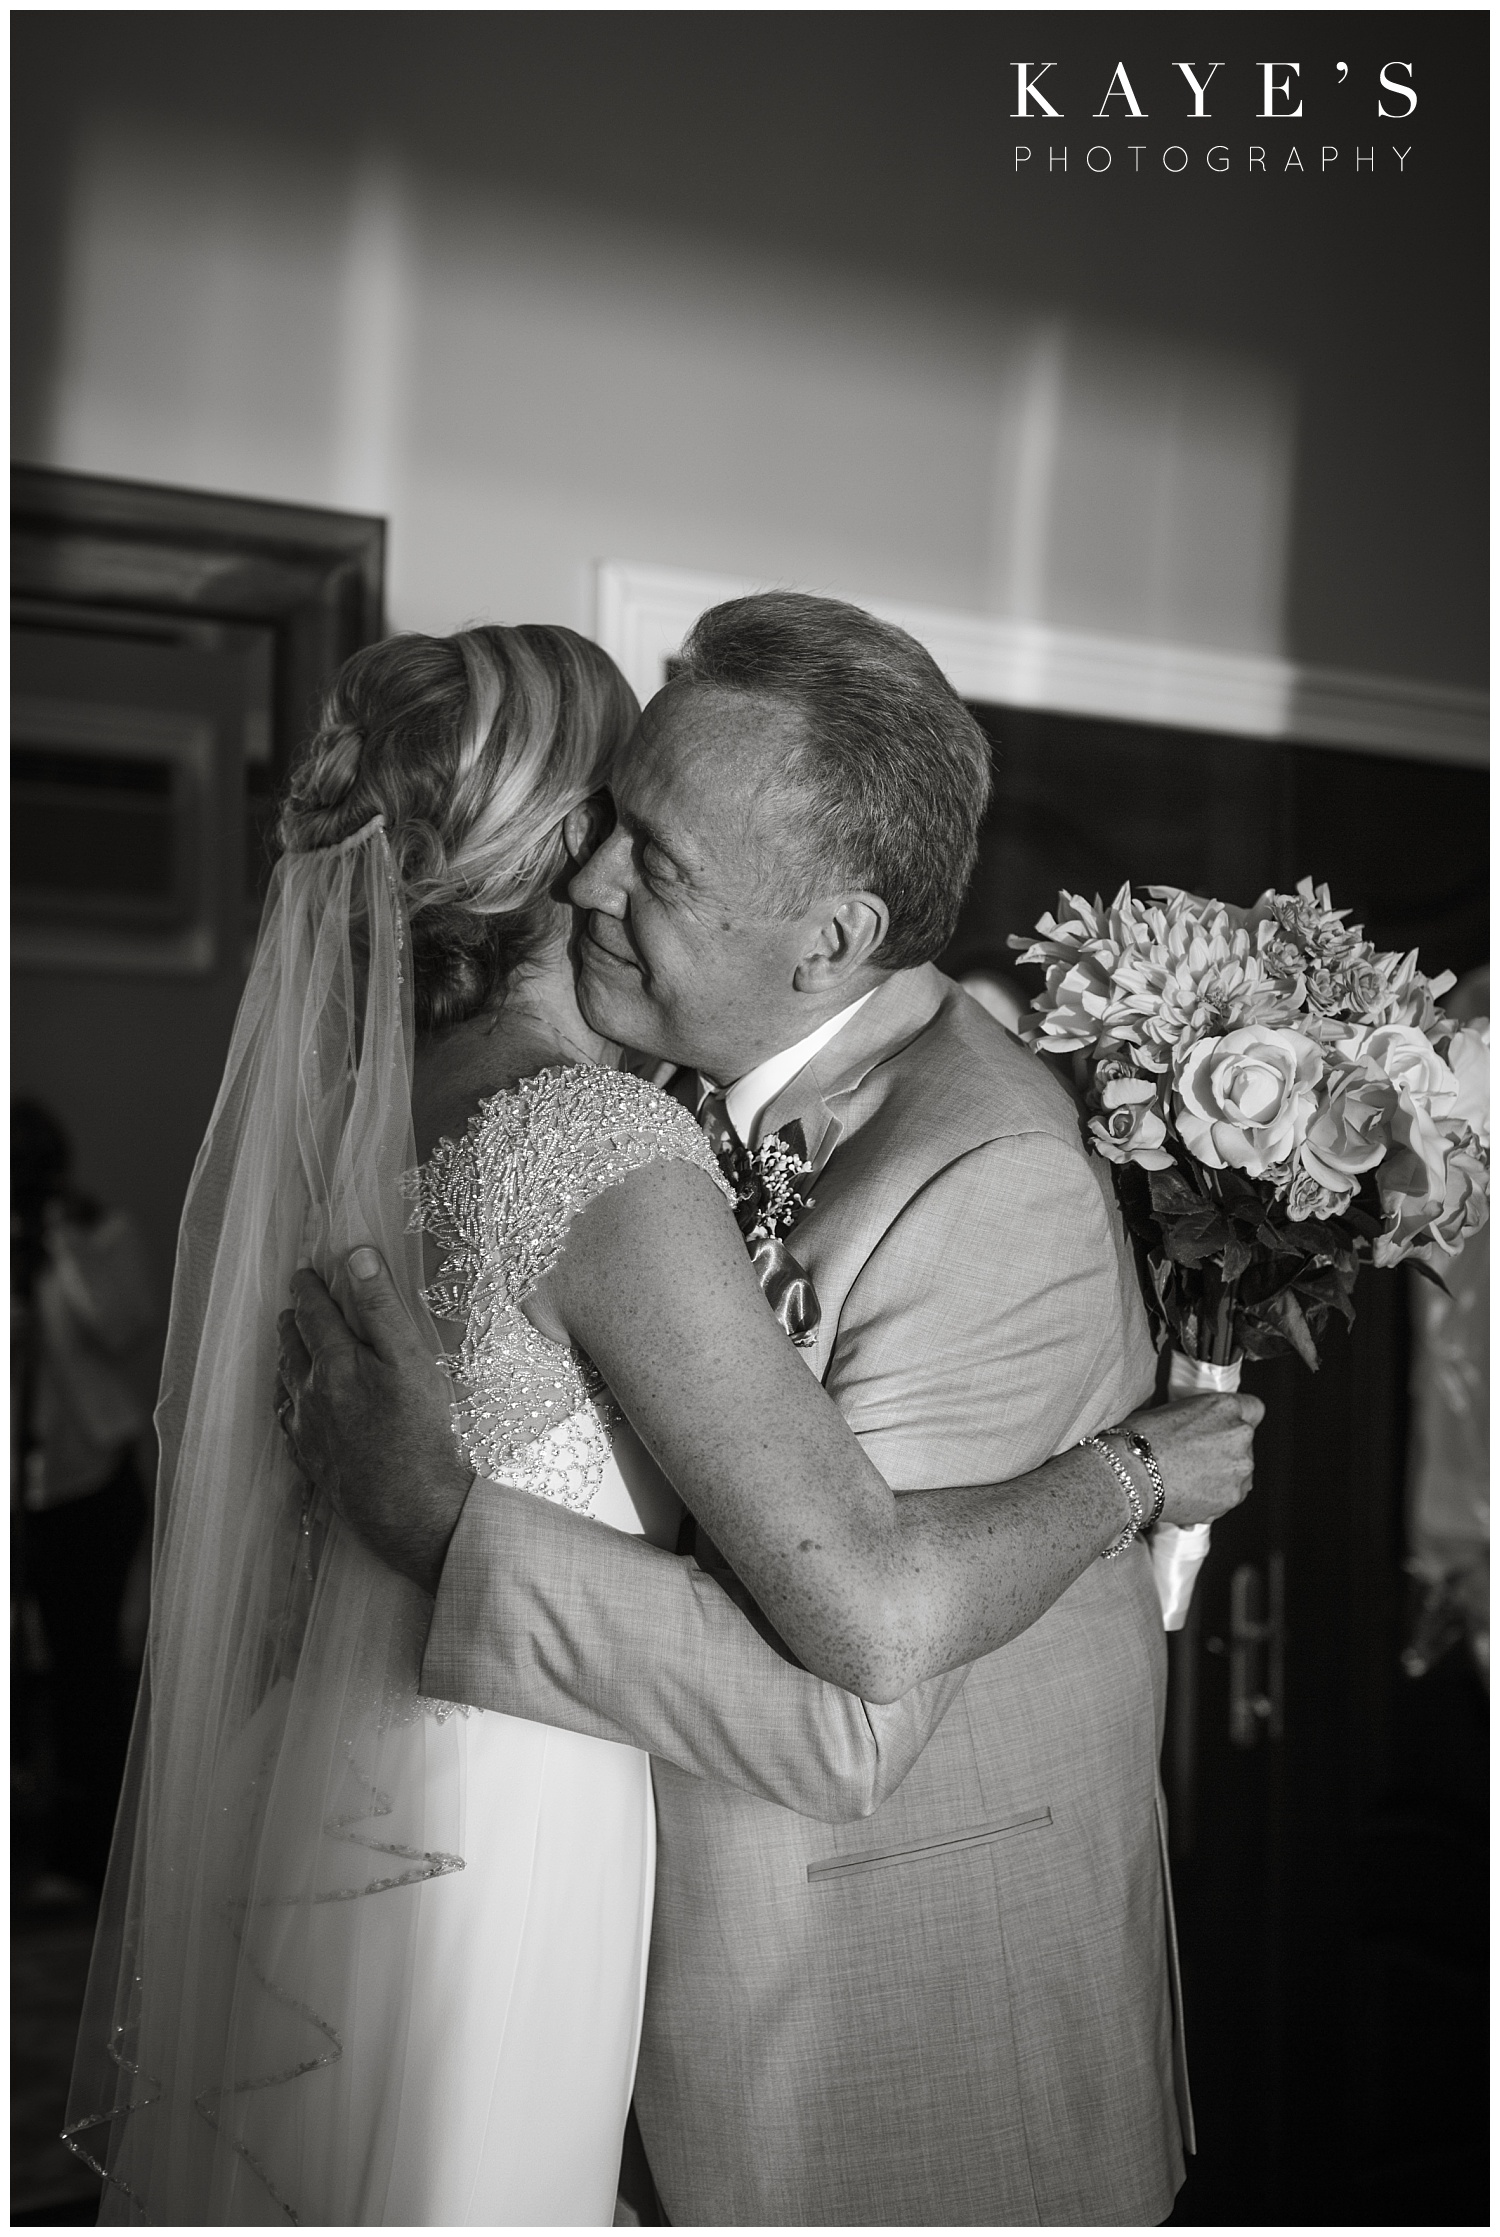 Lake-michigan-beach-wedding-kayes-photography